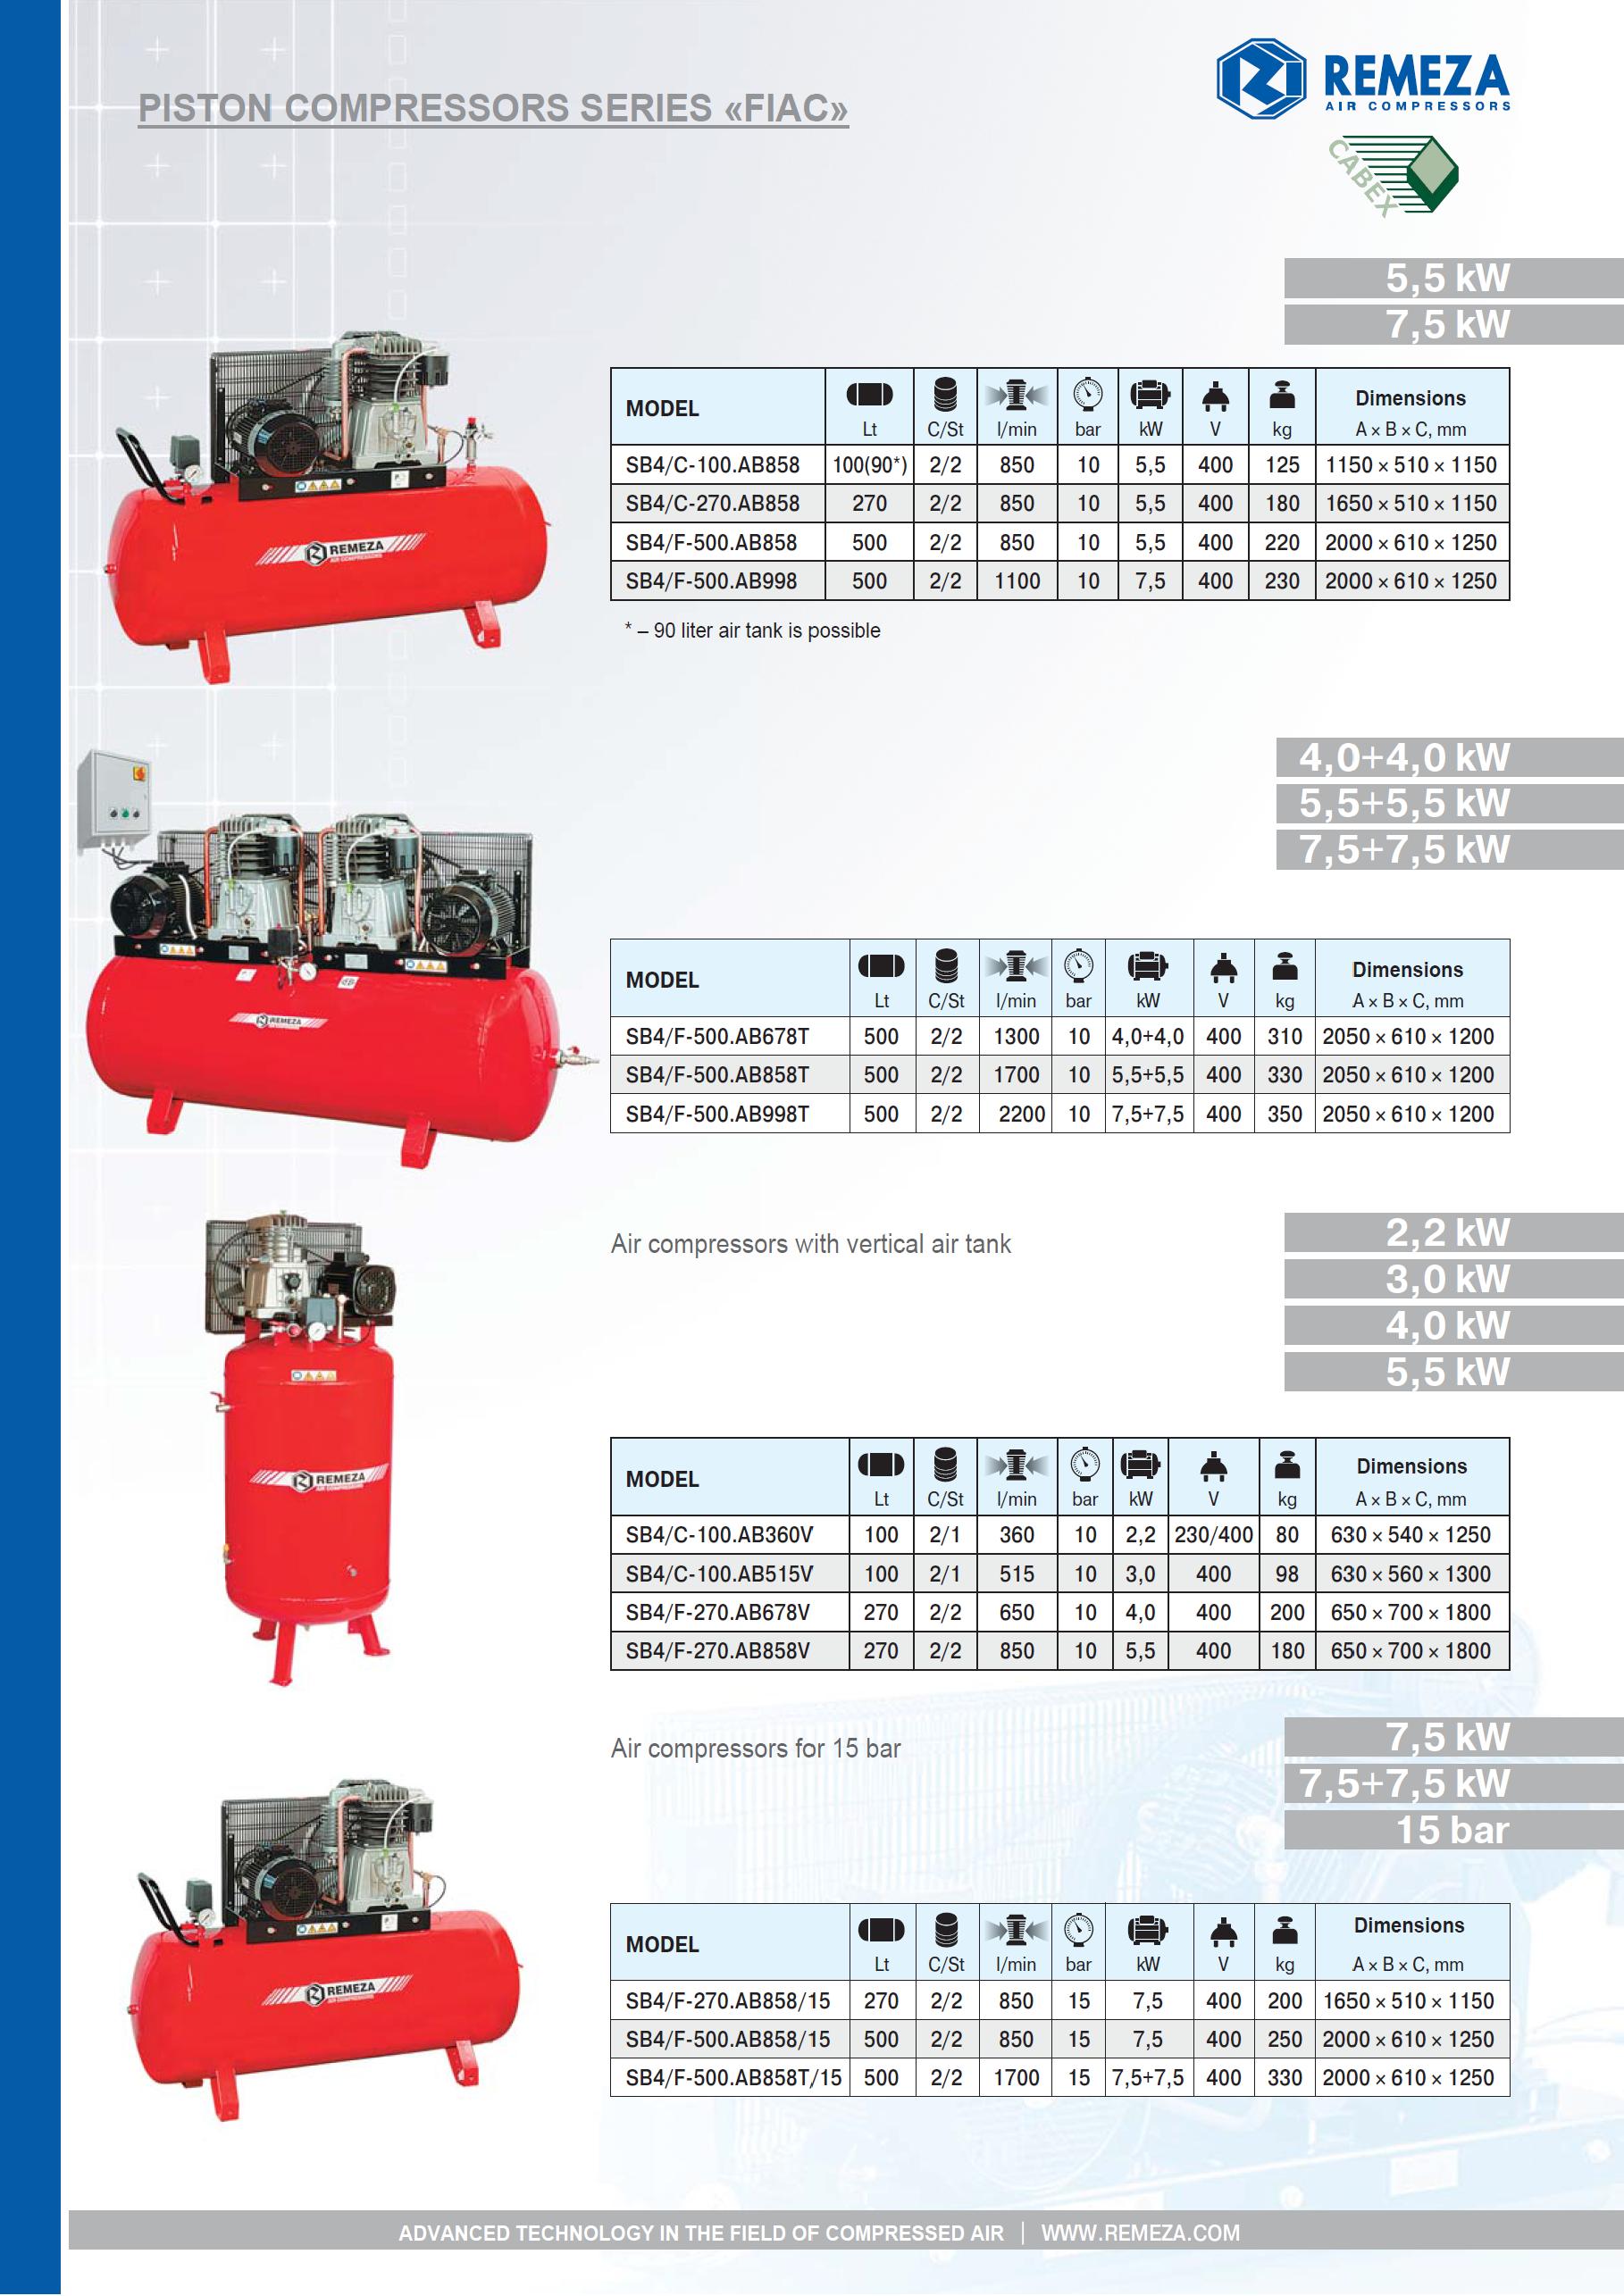 2_piston-compressors-fiac-series_pag_2